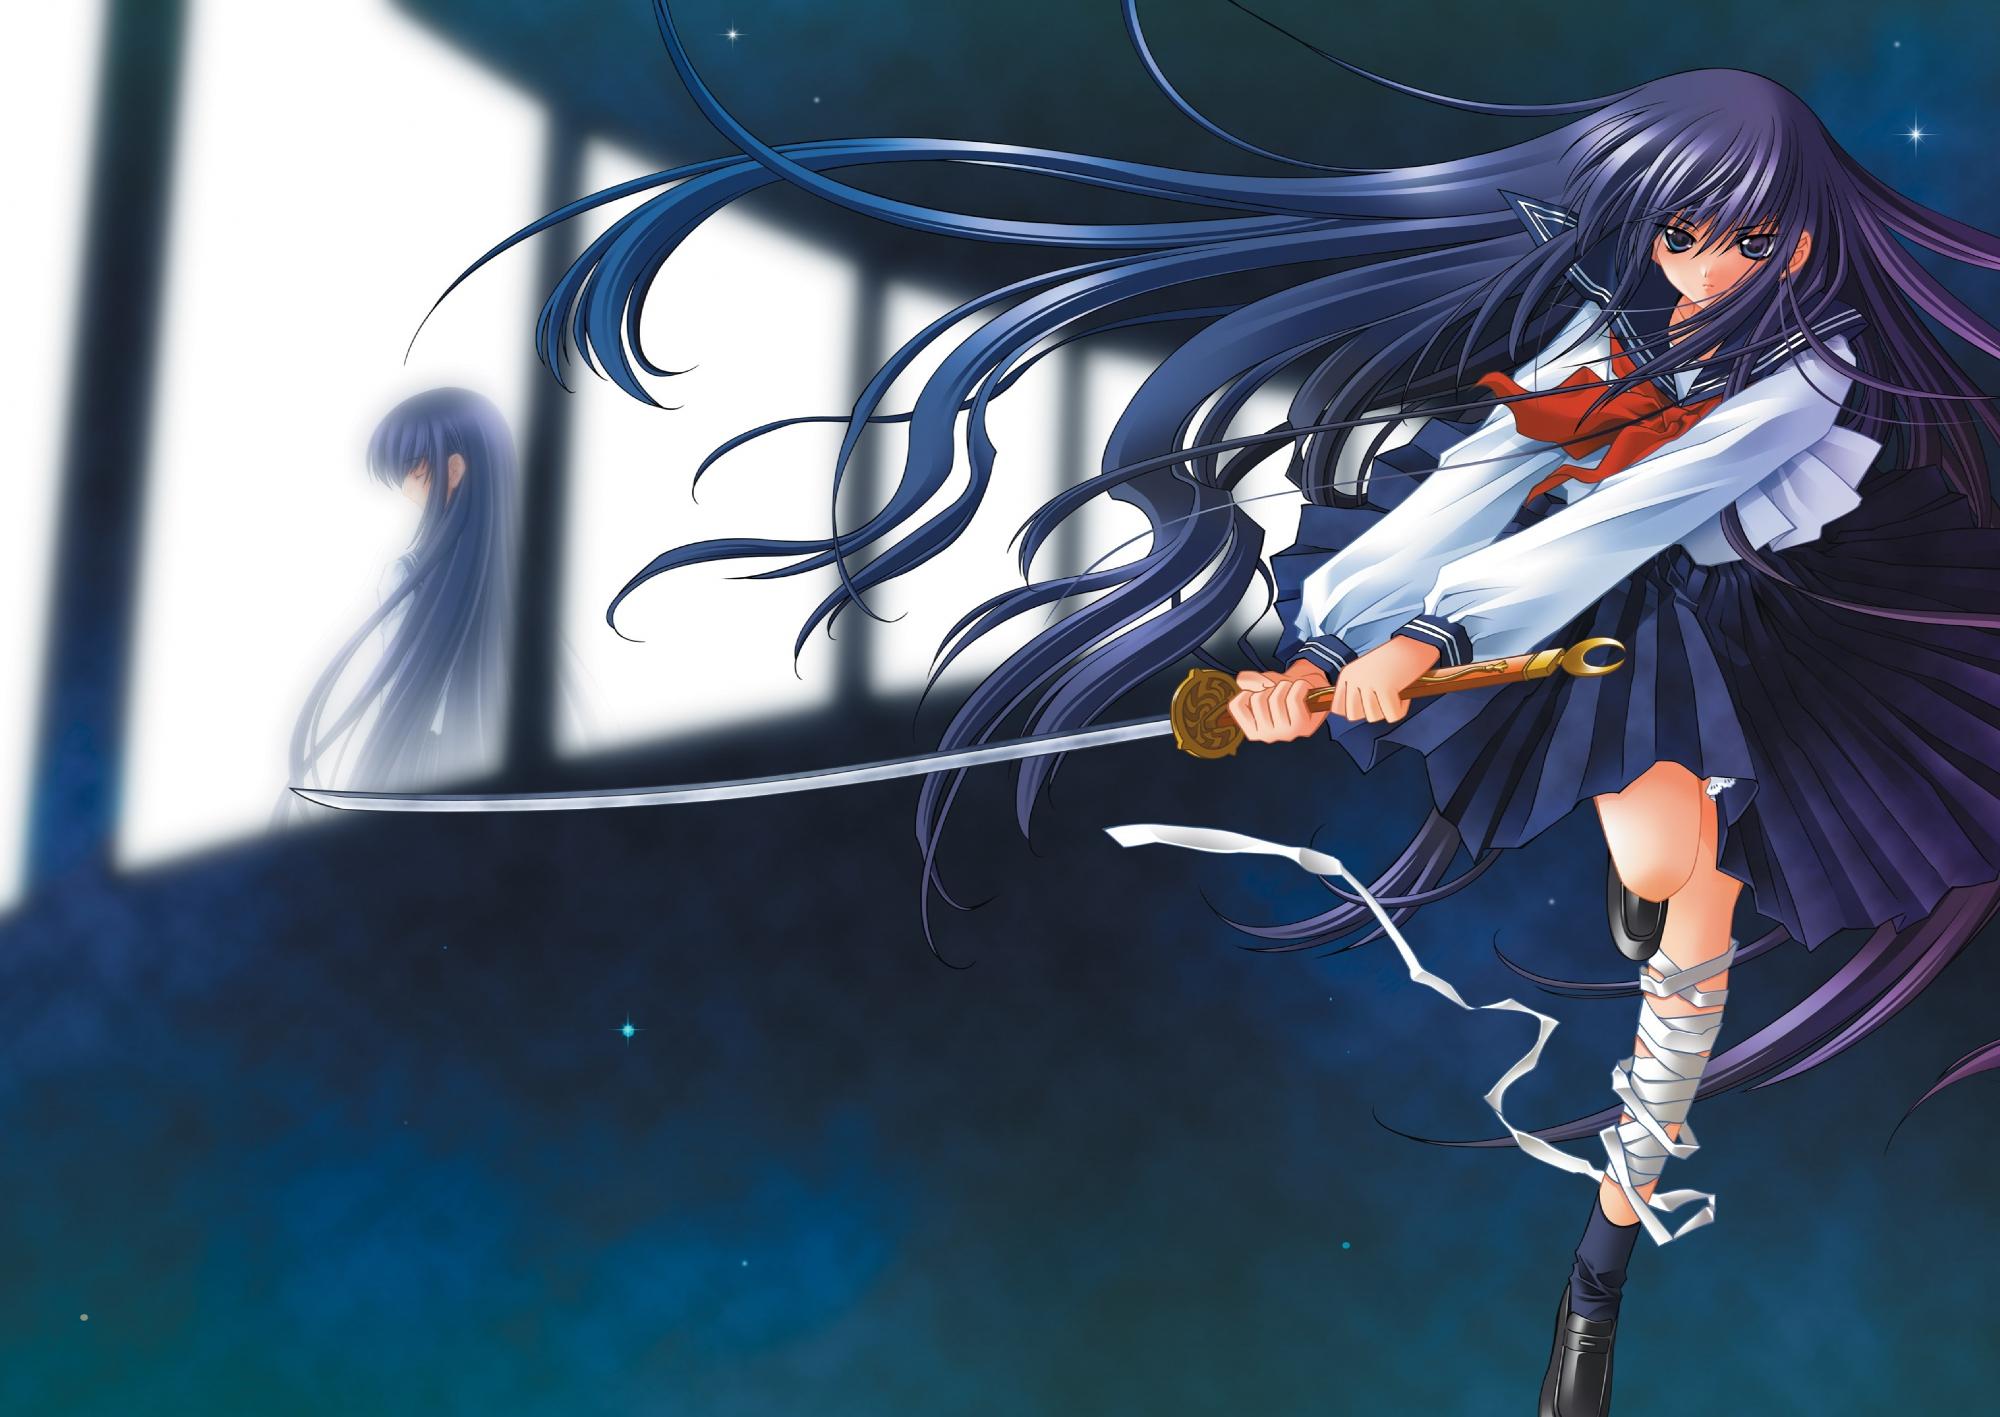 azuma_hazuki bandage carnelian long_hair school_uniform sword weapon yami_to_boushi_to_hon_no_tabibito